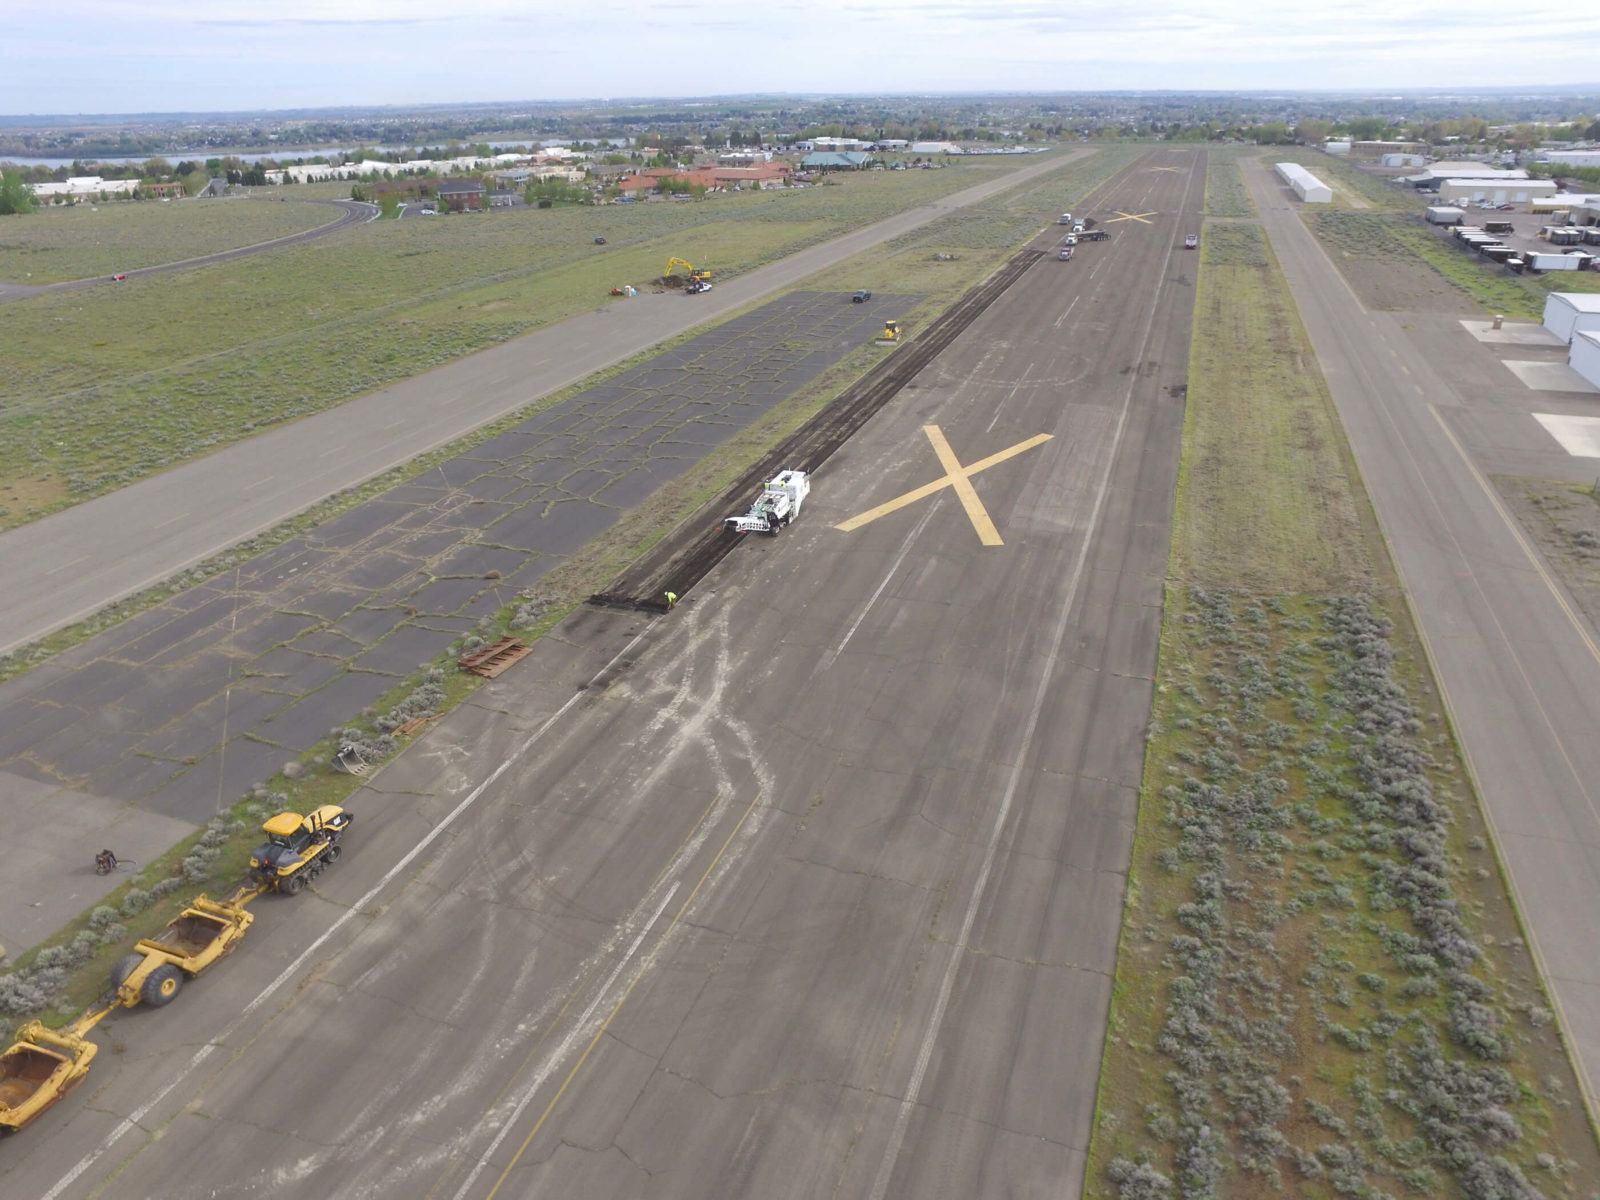 Aerial view of heavy equipment grinding asphalt.